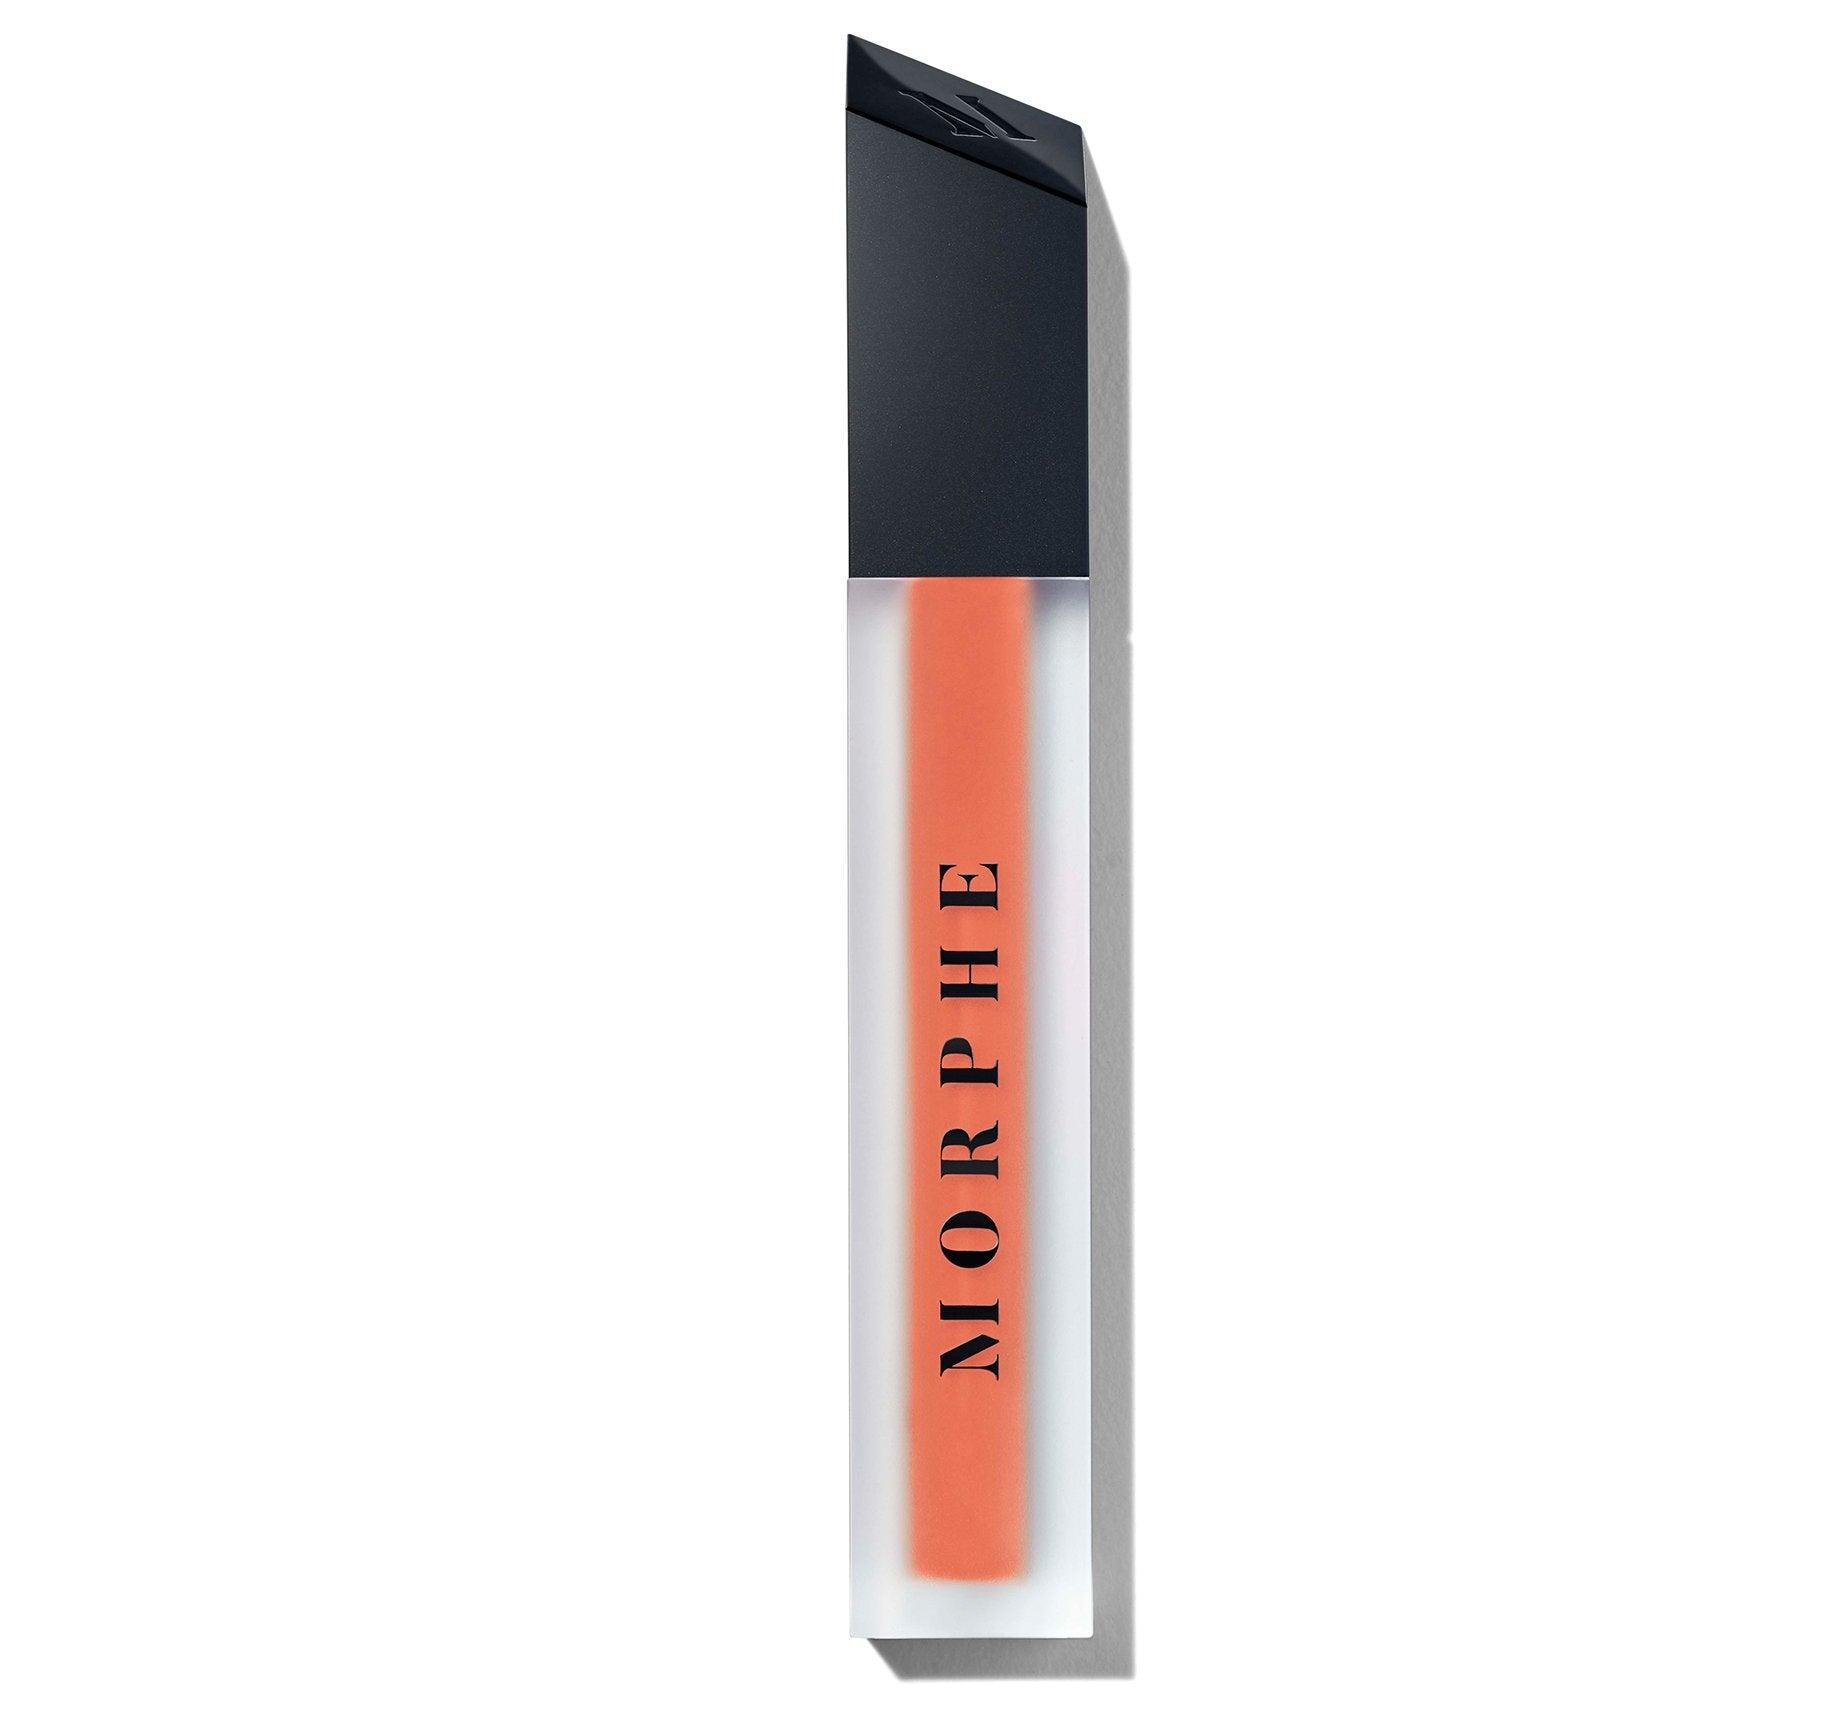 Morphe - Matte Liquid Lipstick, Peanut